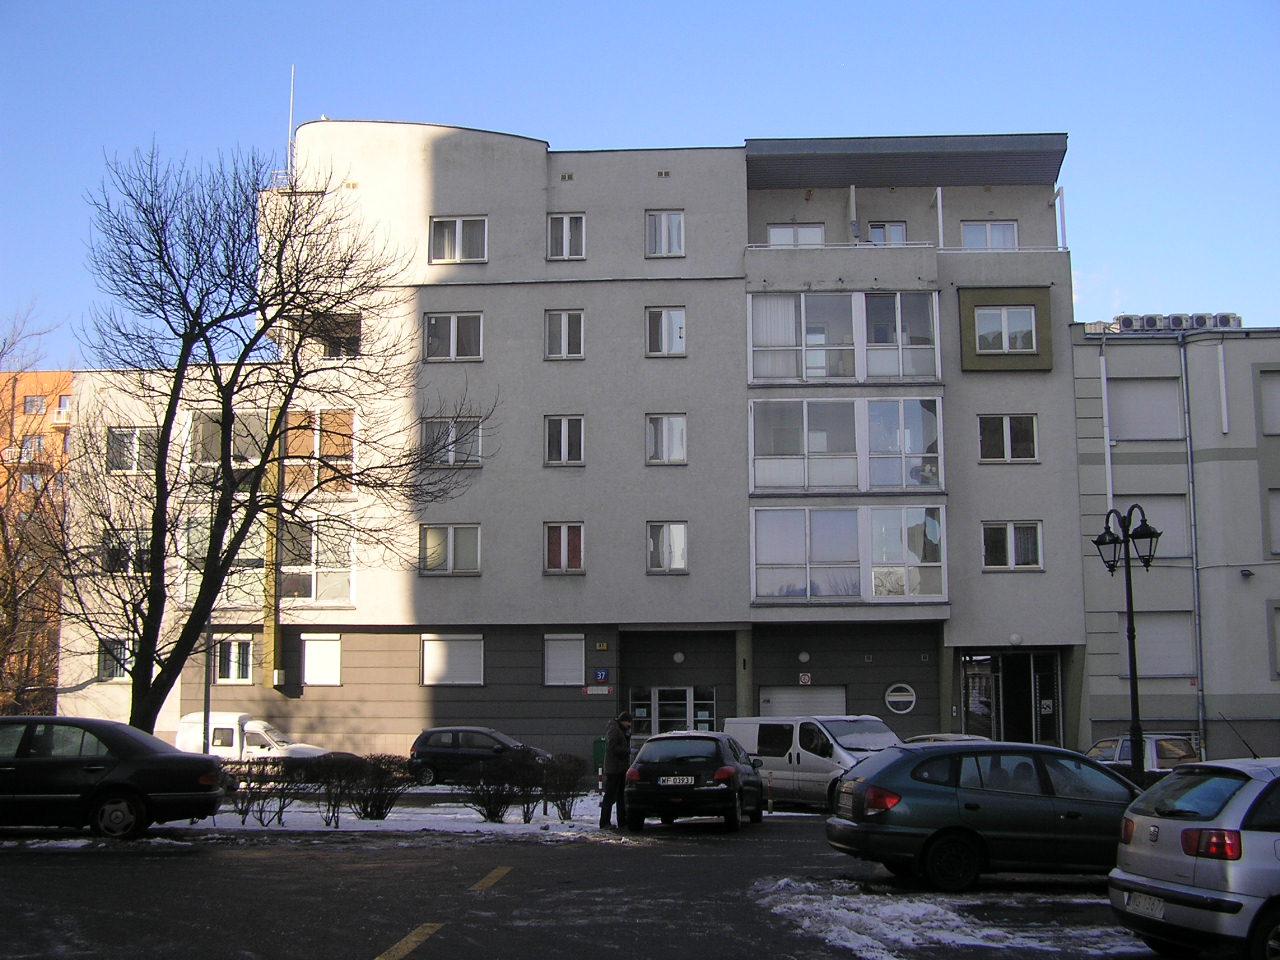 Krypska 37